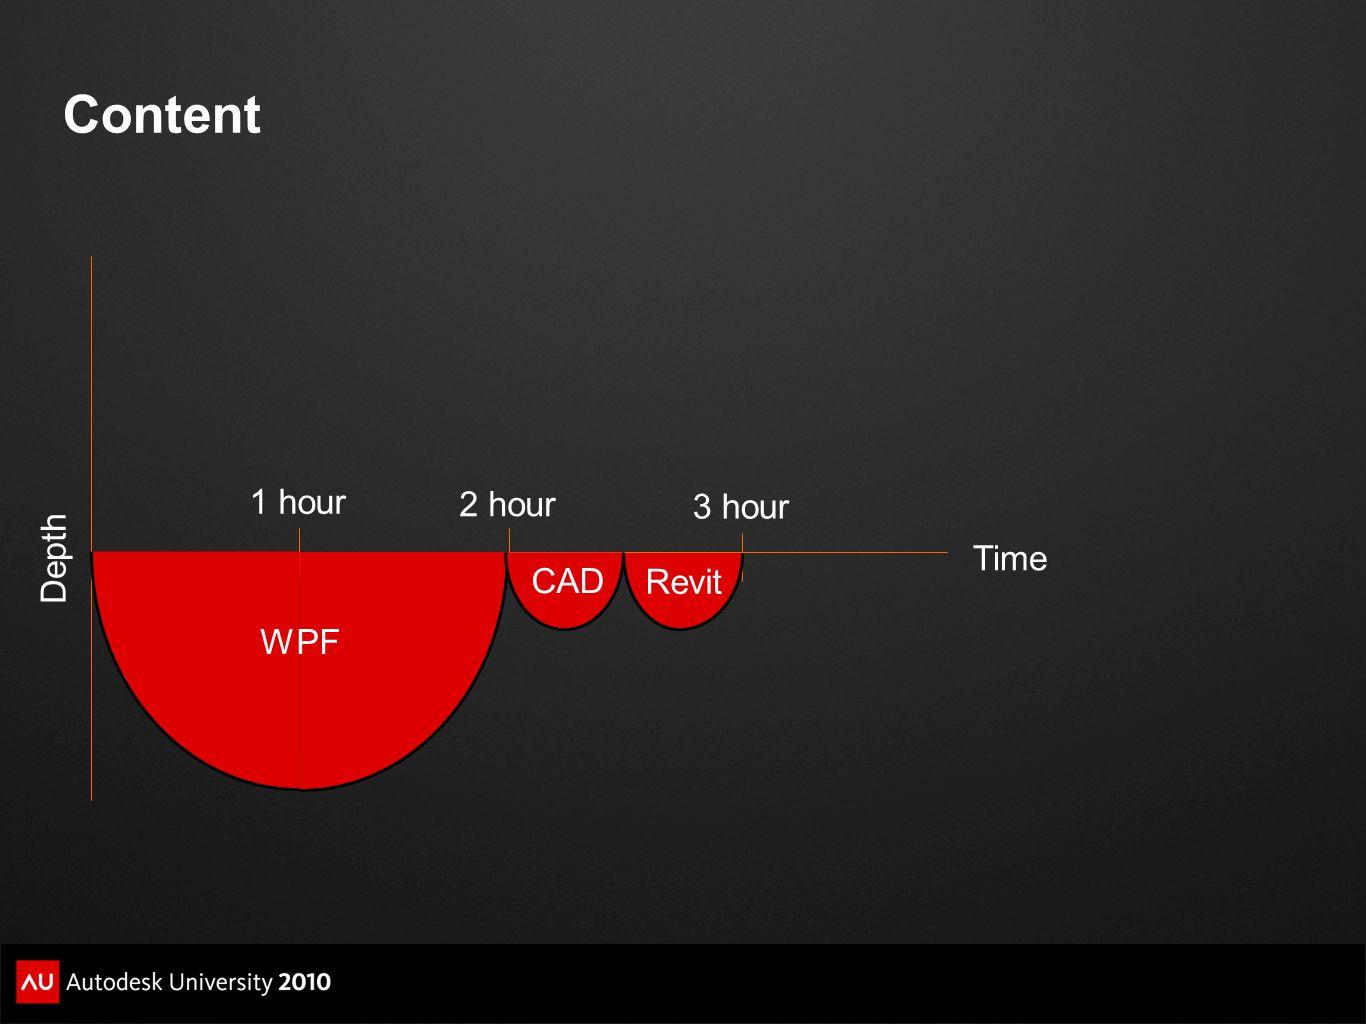 Content Depth Time 1 hour 3 hour 2 hour WPF Revit CAD